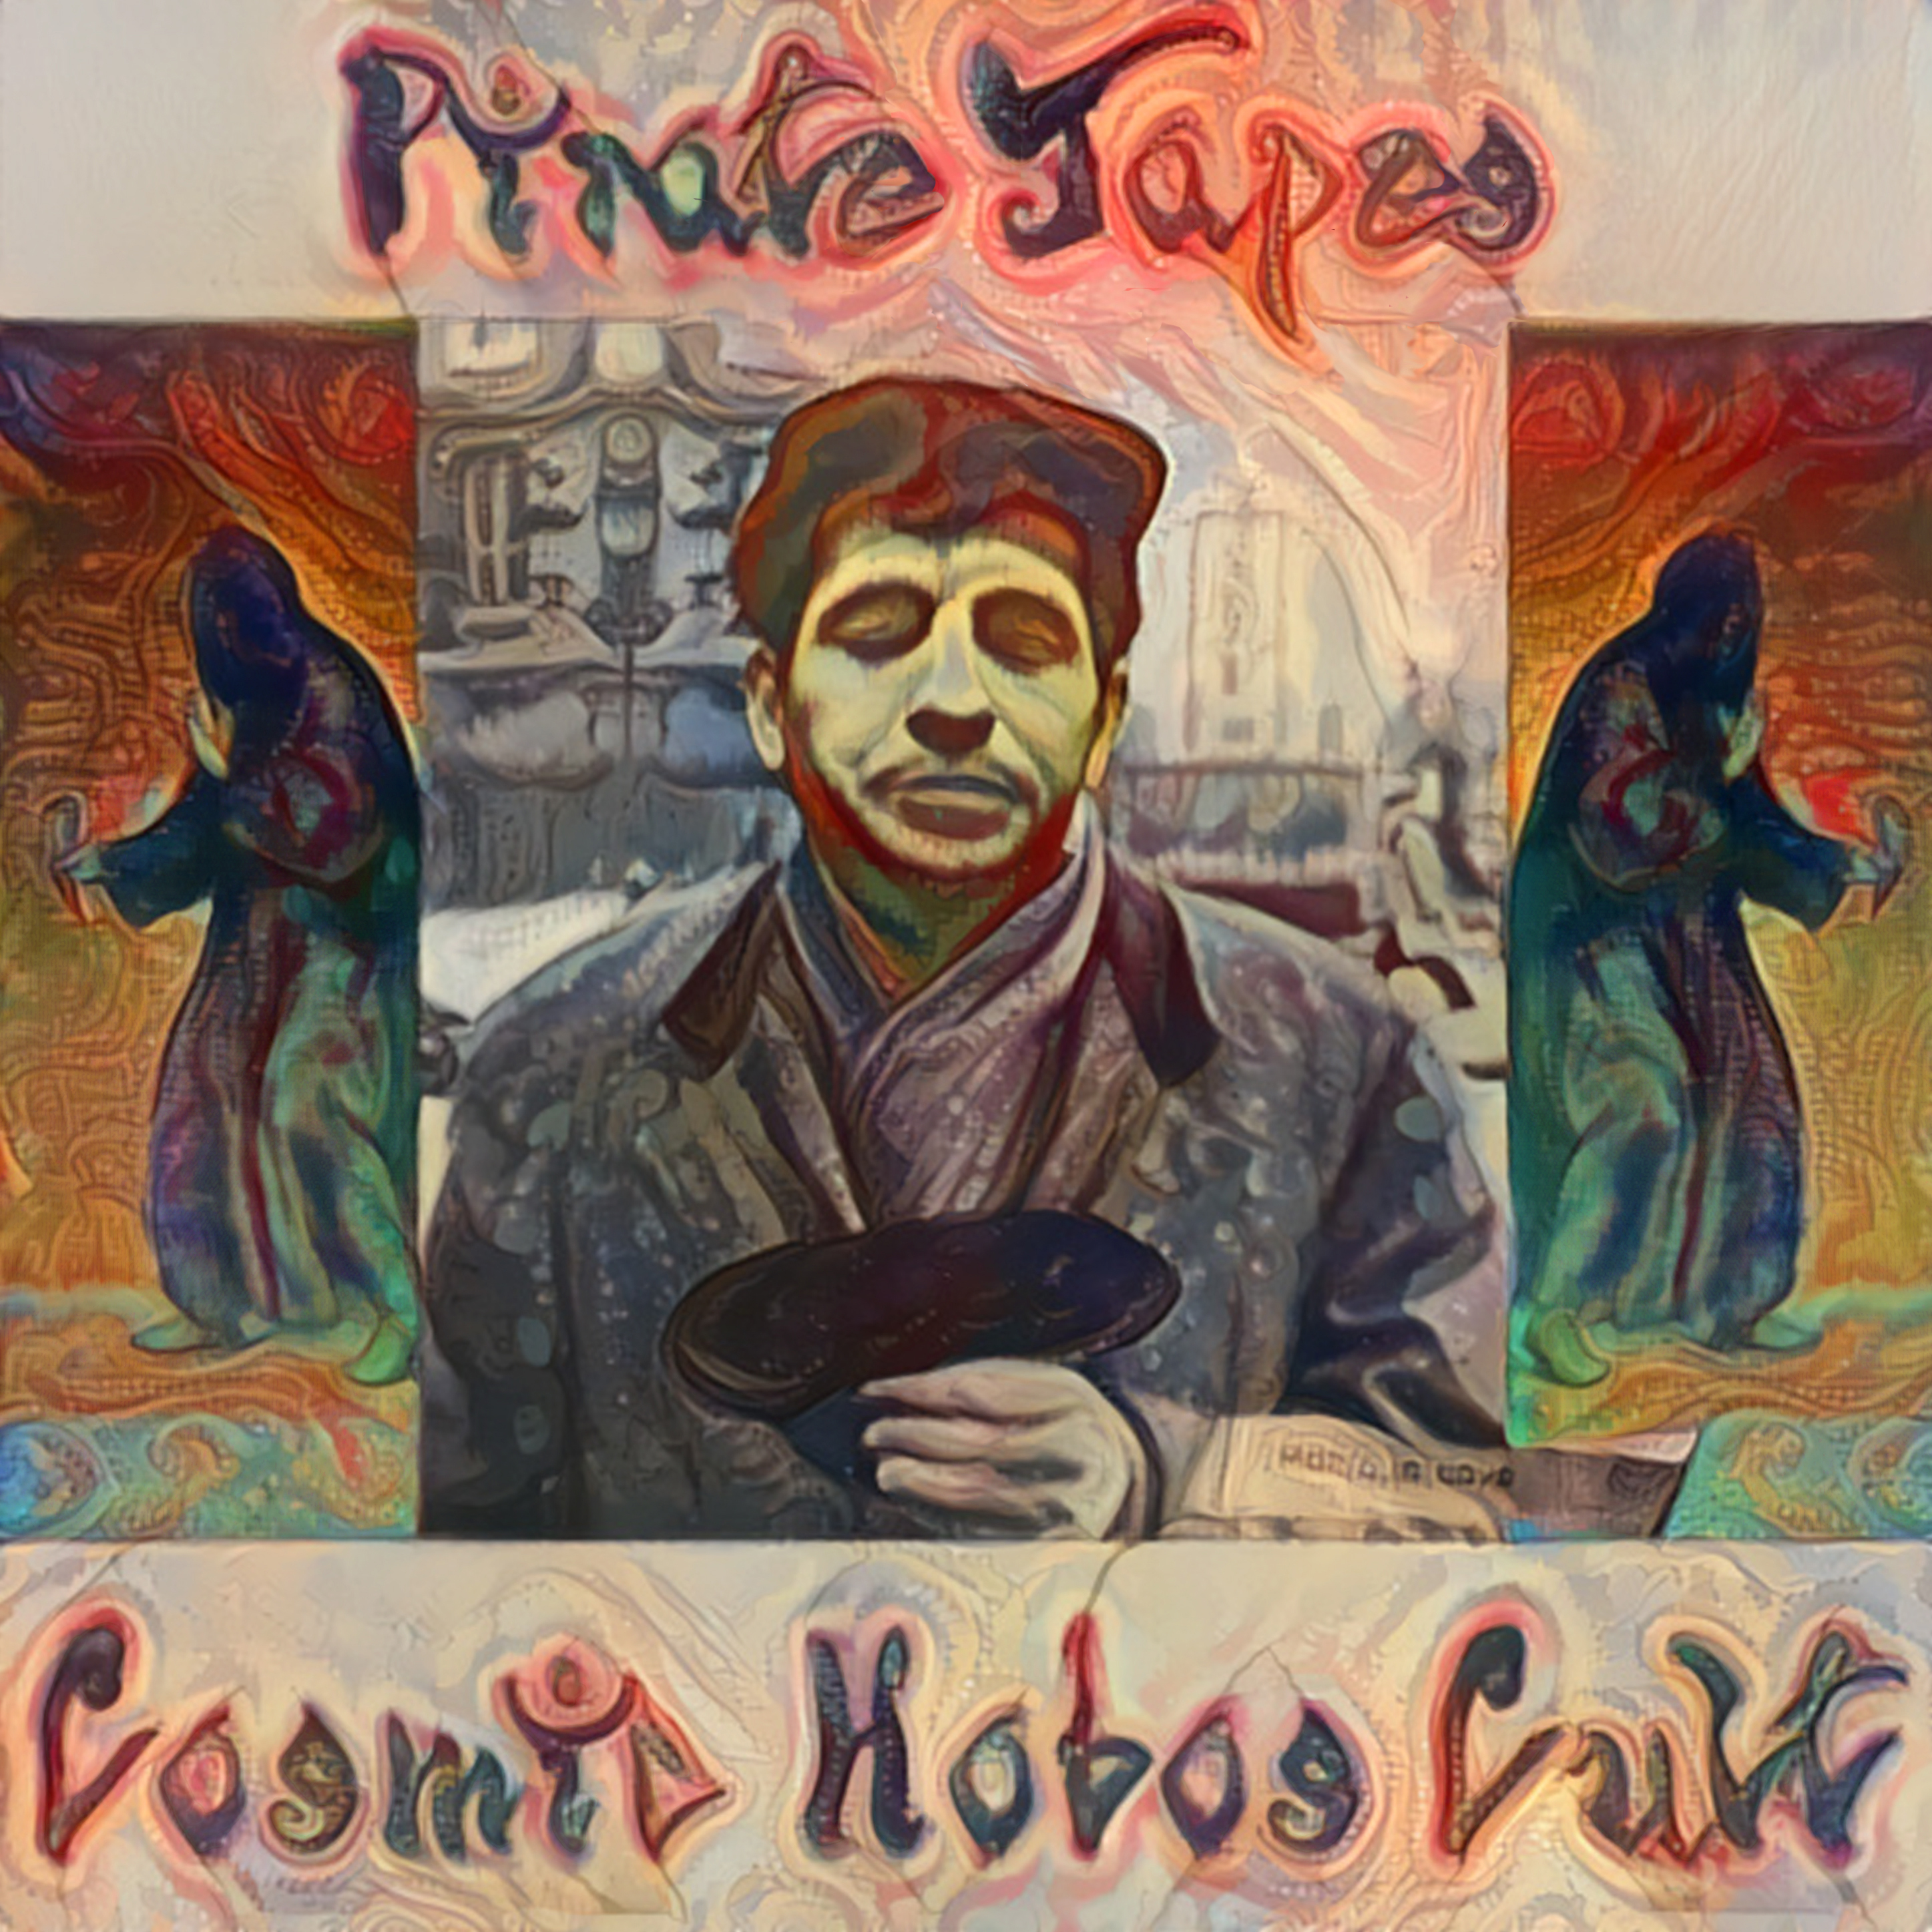 PIRATE Tapes – Cosmic Hobos Cult